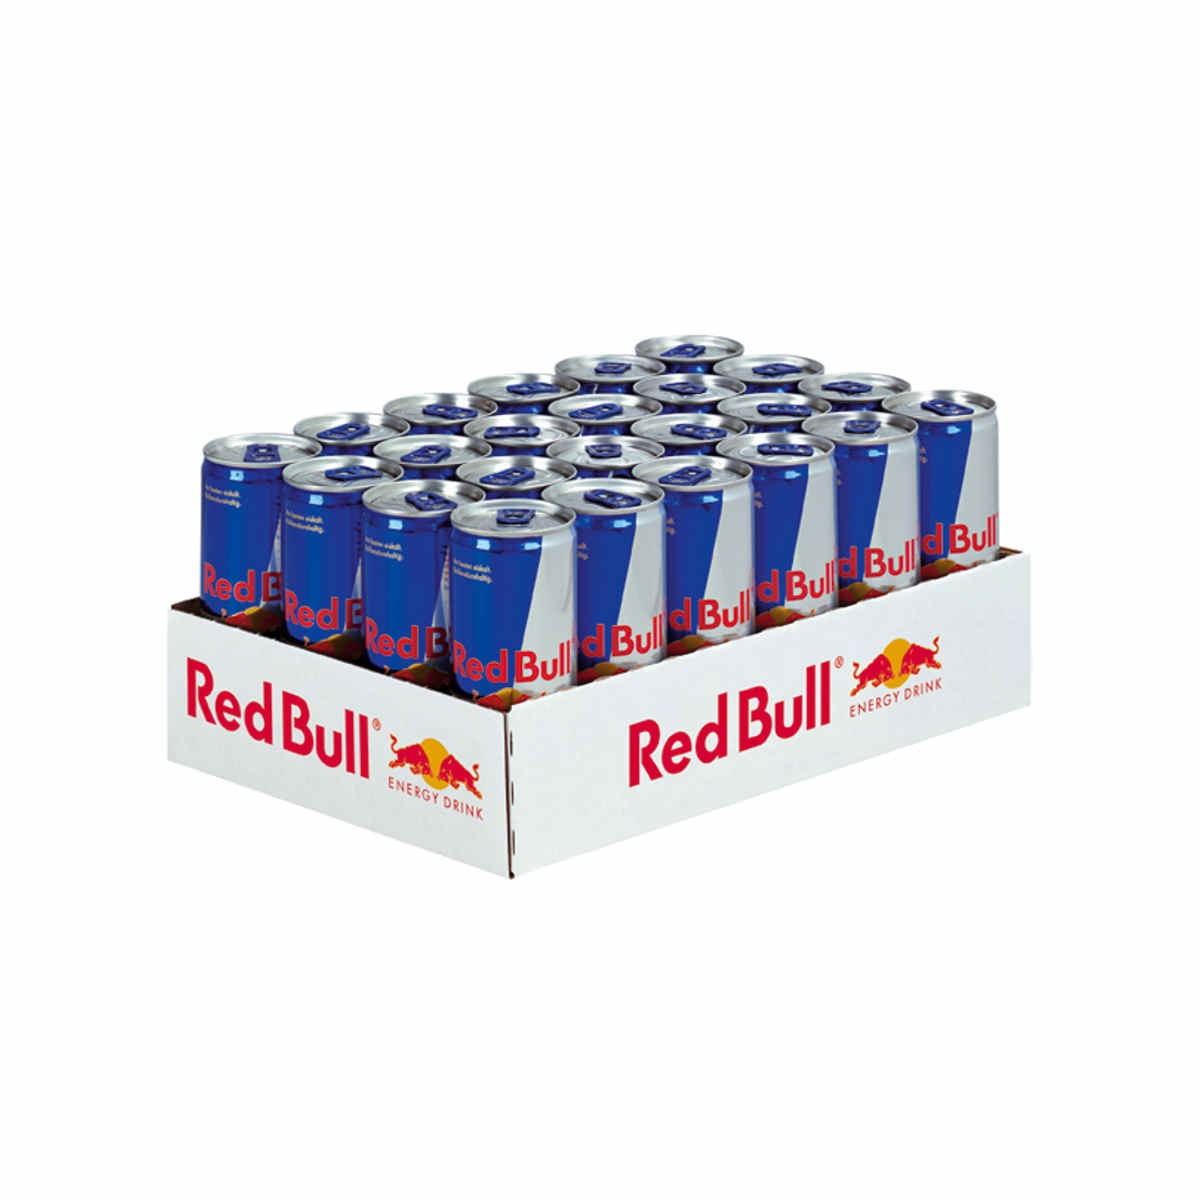 red bull energy drink lattina cl25 x 24 pz. Black Bedroom Furniture Sets. Home Design Ideas